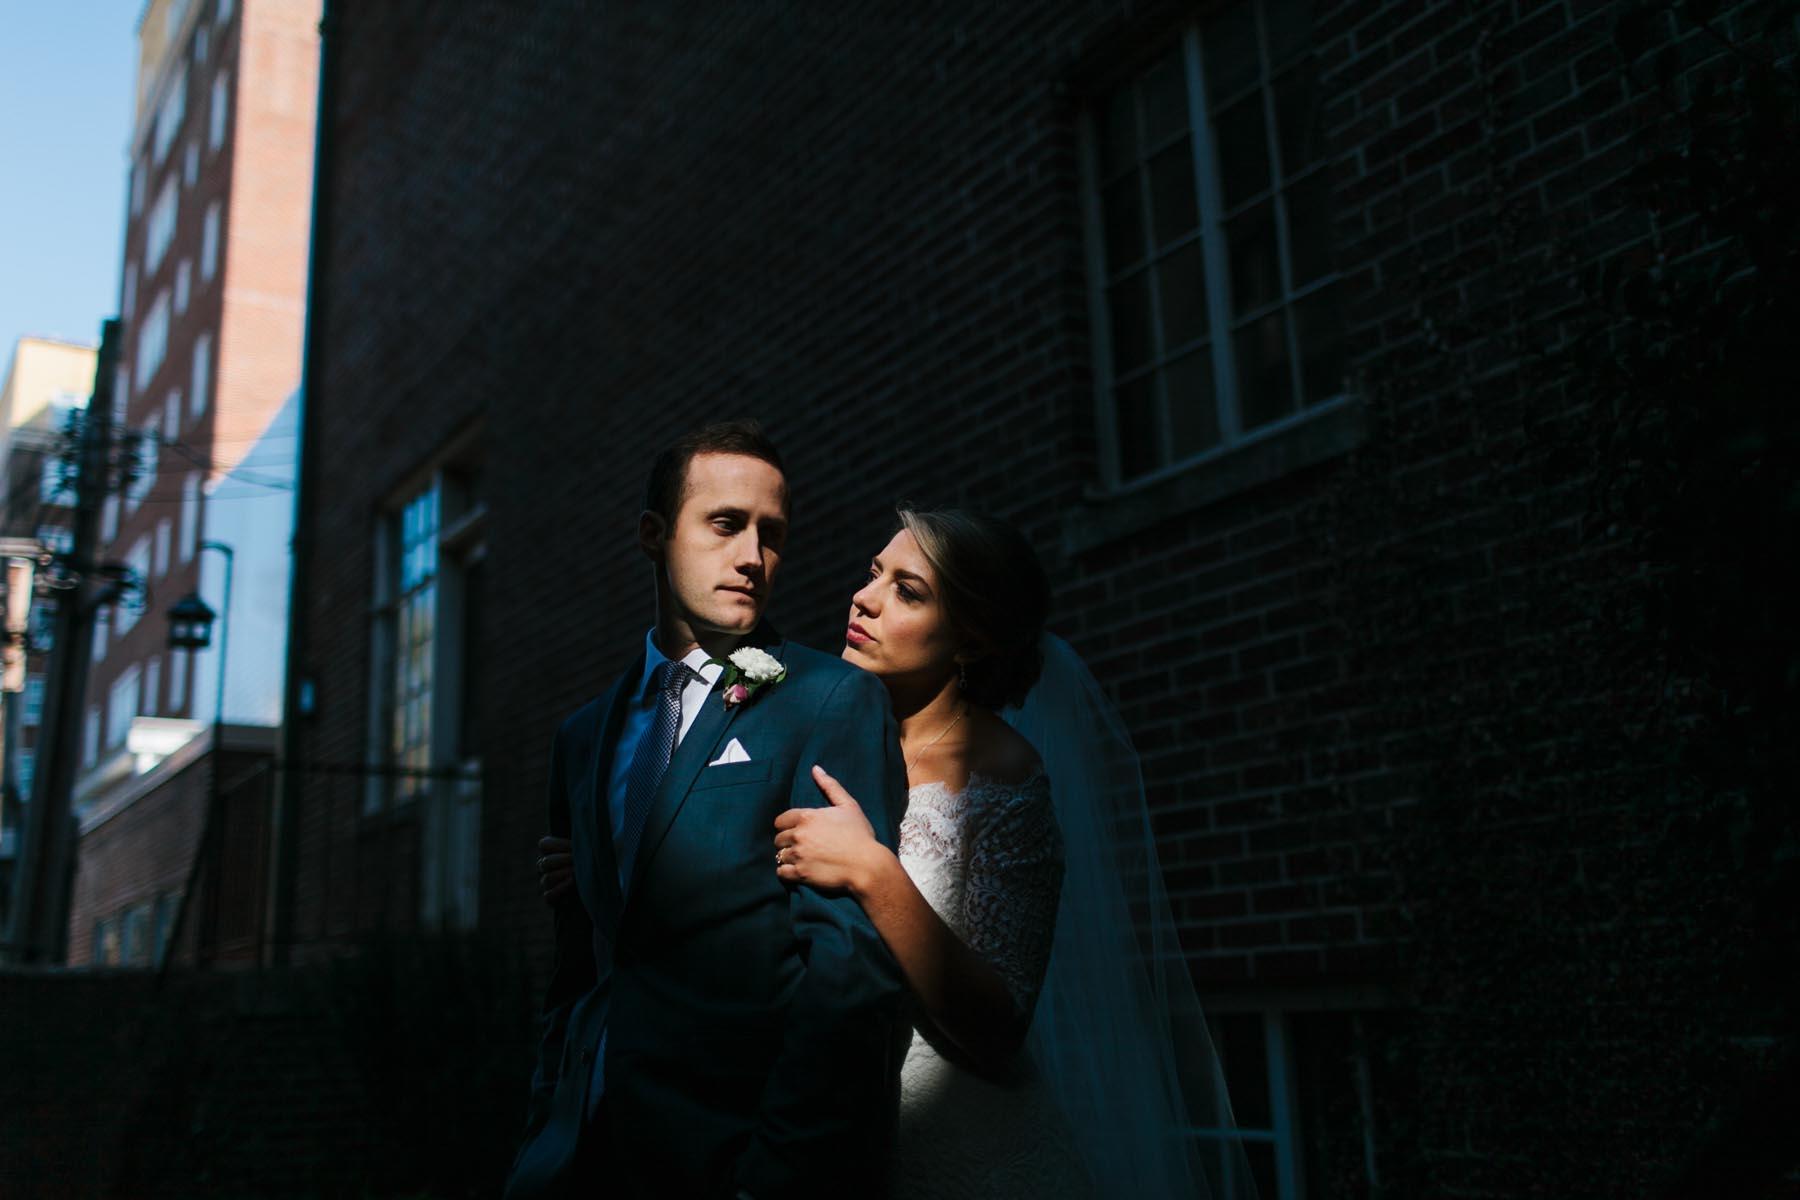 kjellman wedding blog biltmore wedding -69